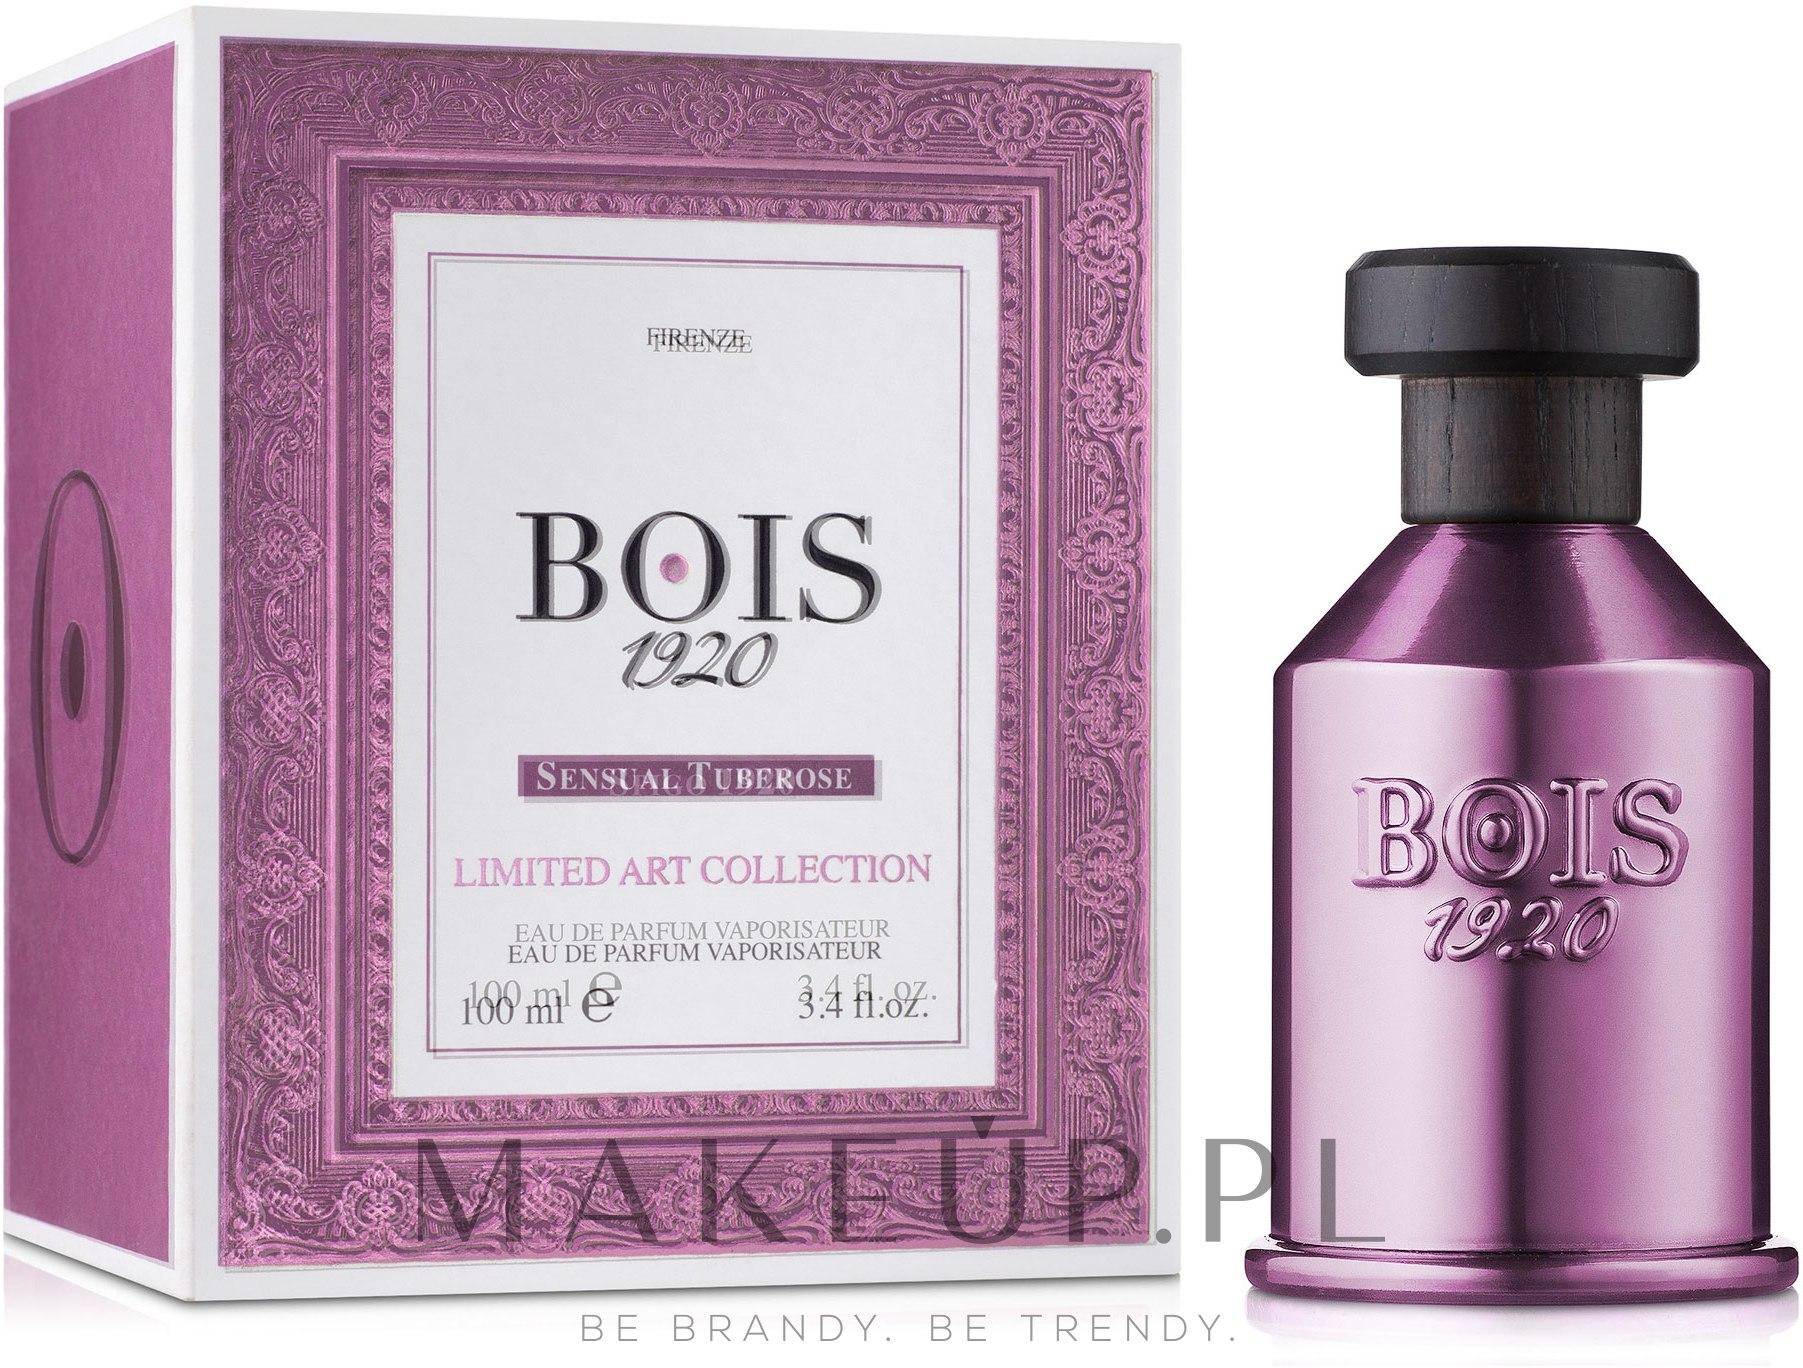 Bois 1920 Sensual Tuberose Limited Art Collection - Woda perfumowana — фото 100 ml